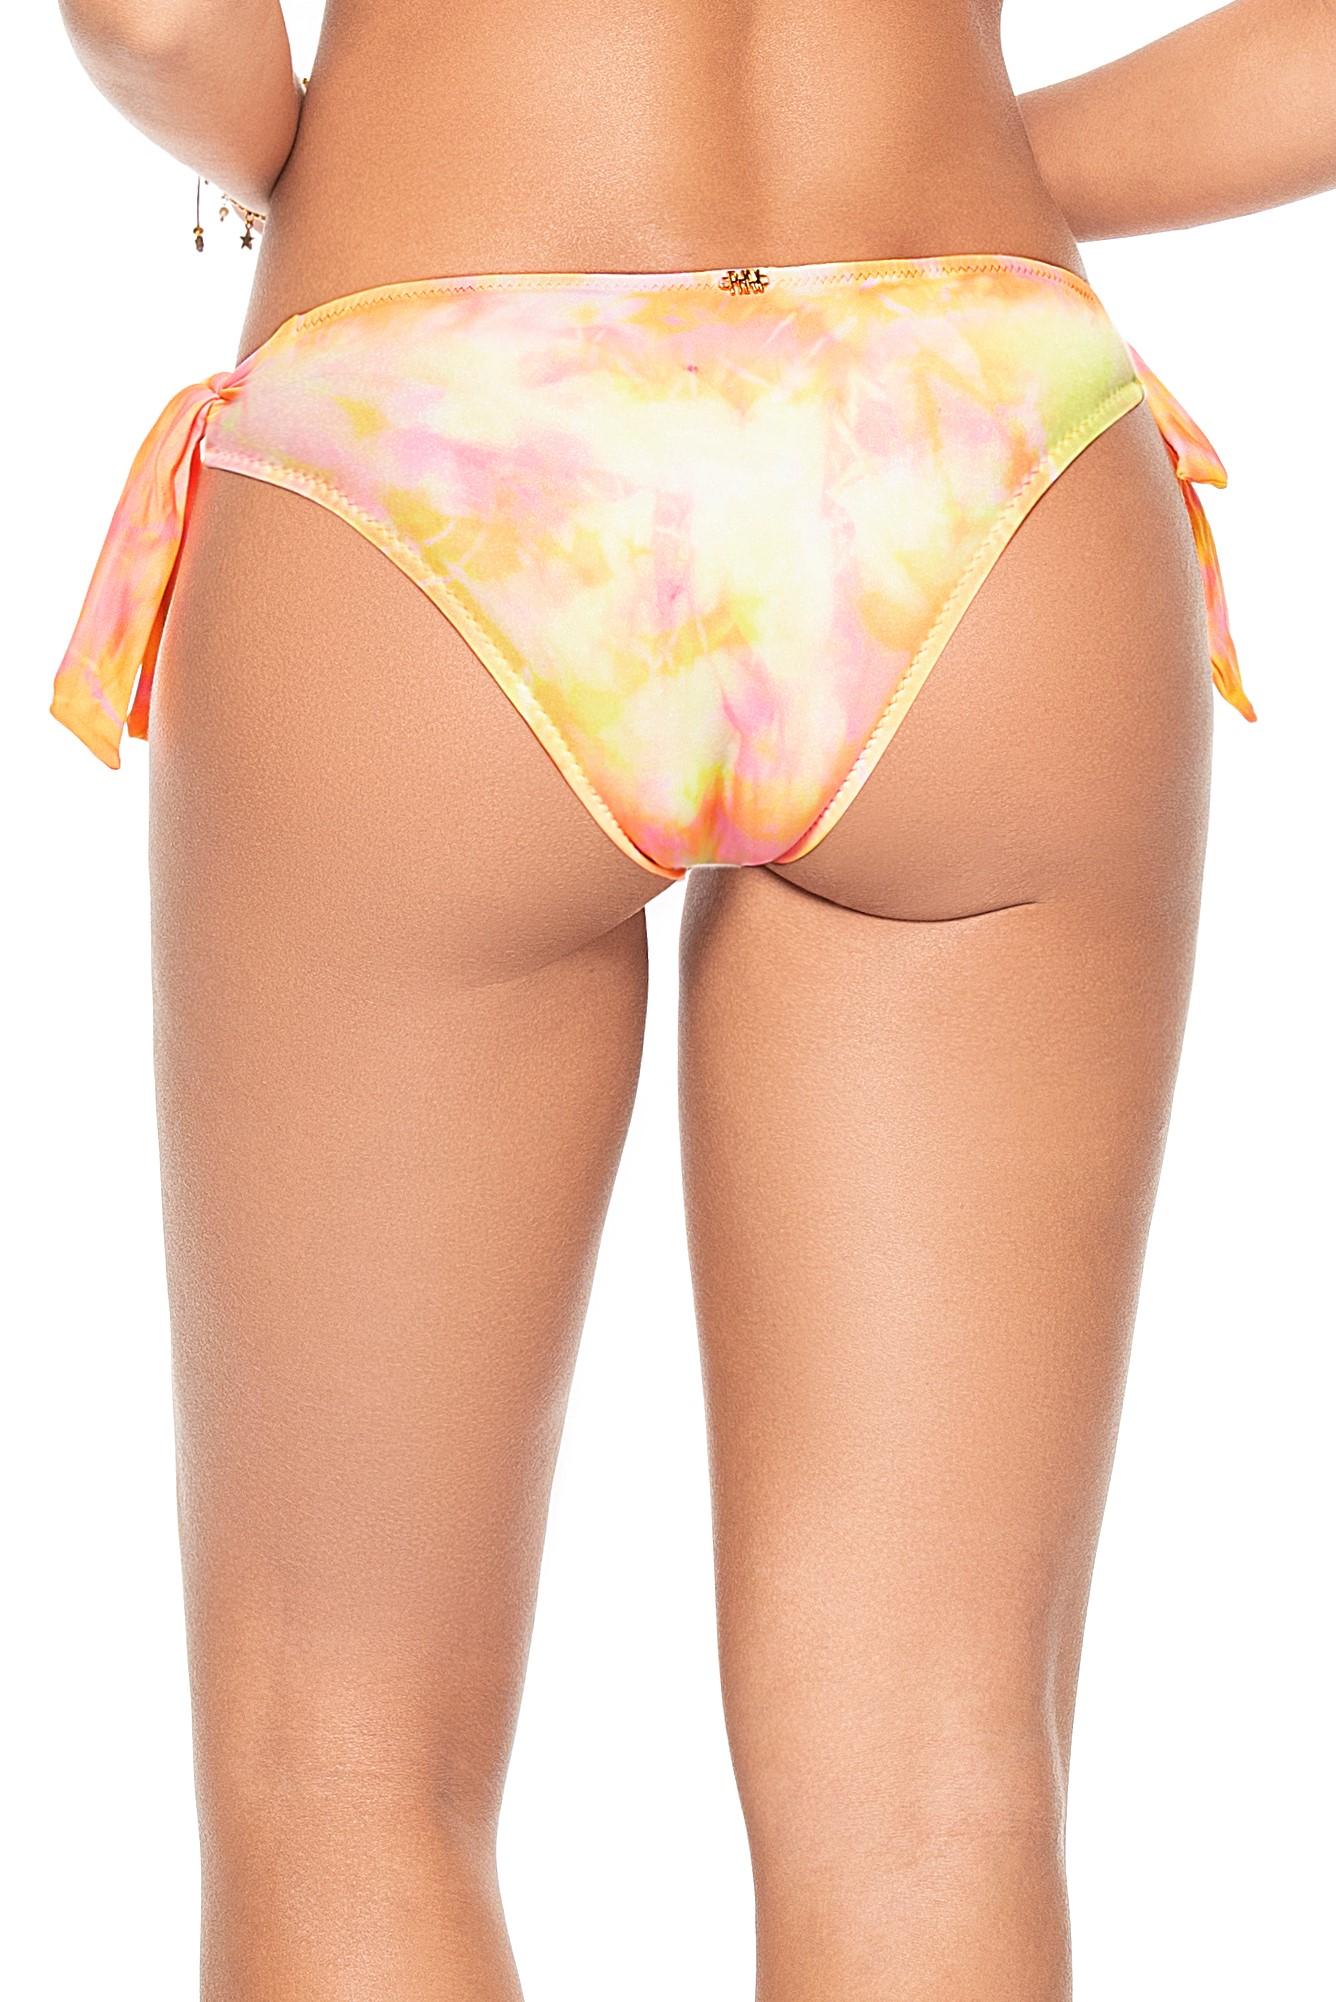 Phax Bella Iceland Yellow Tie Dye Tie Side Bikini Bottom